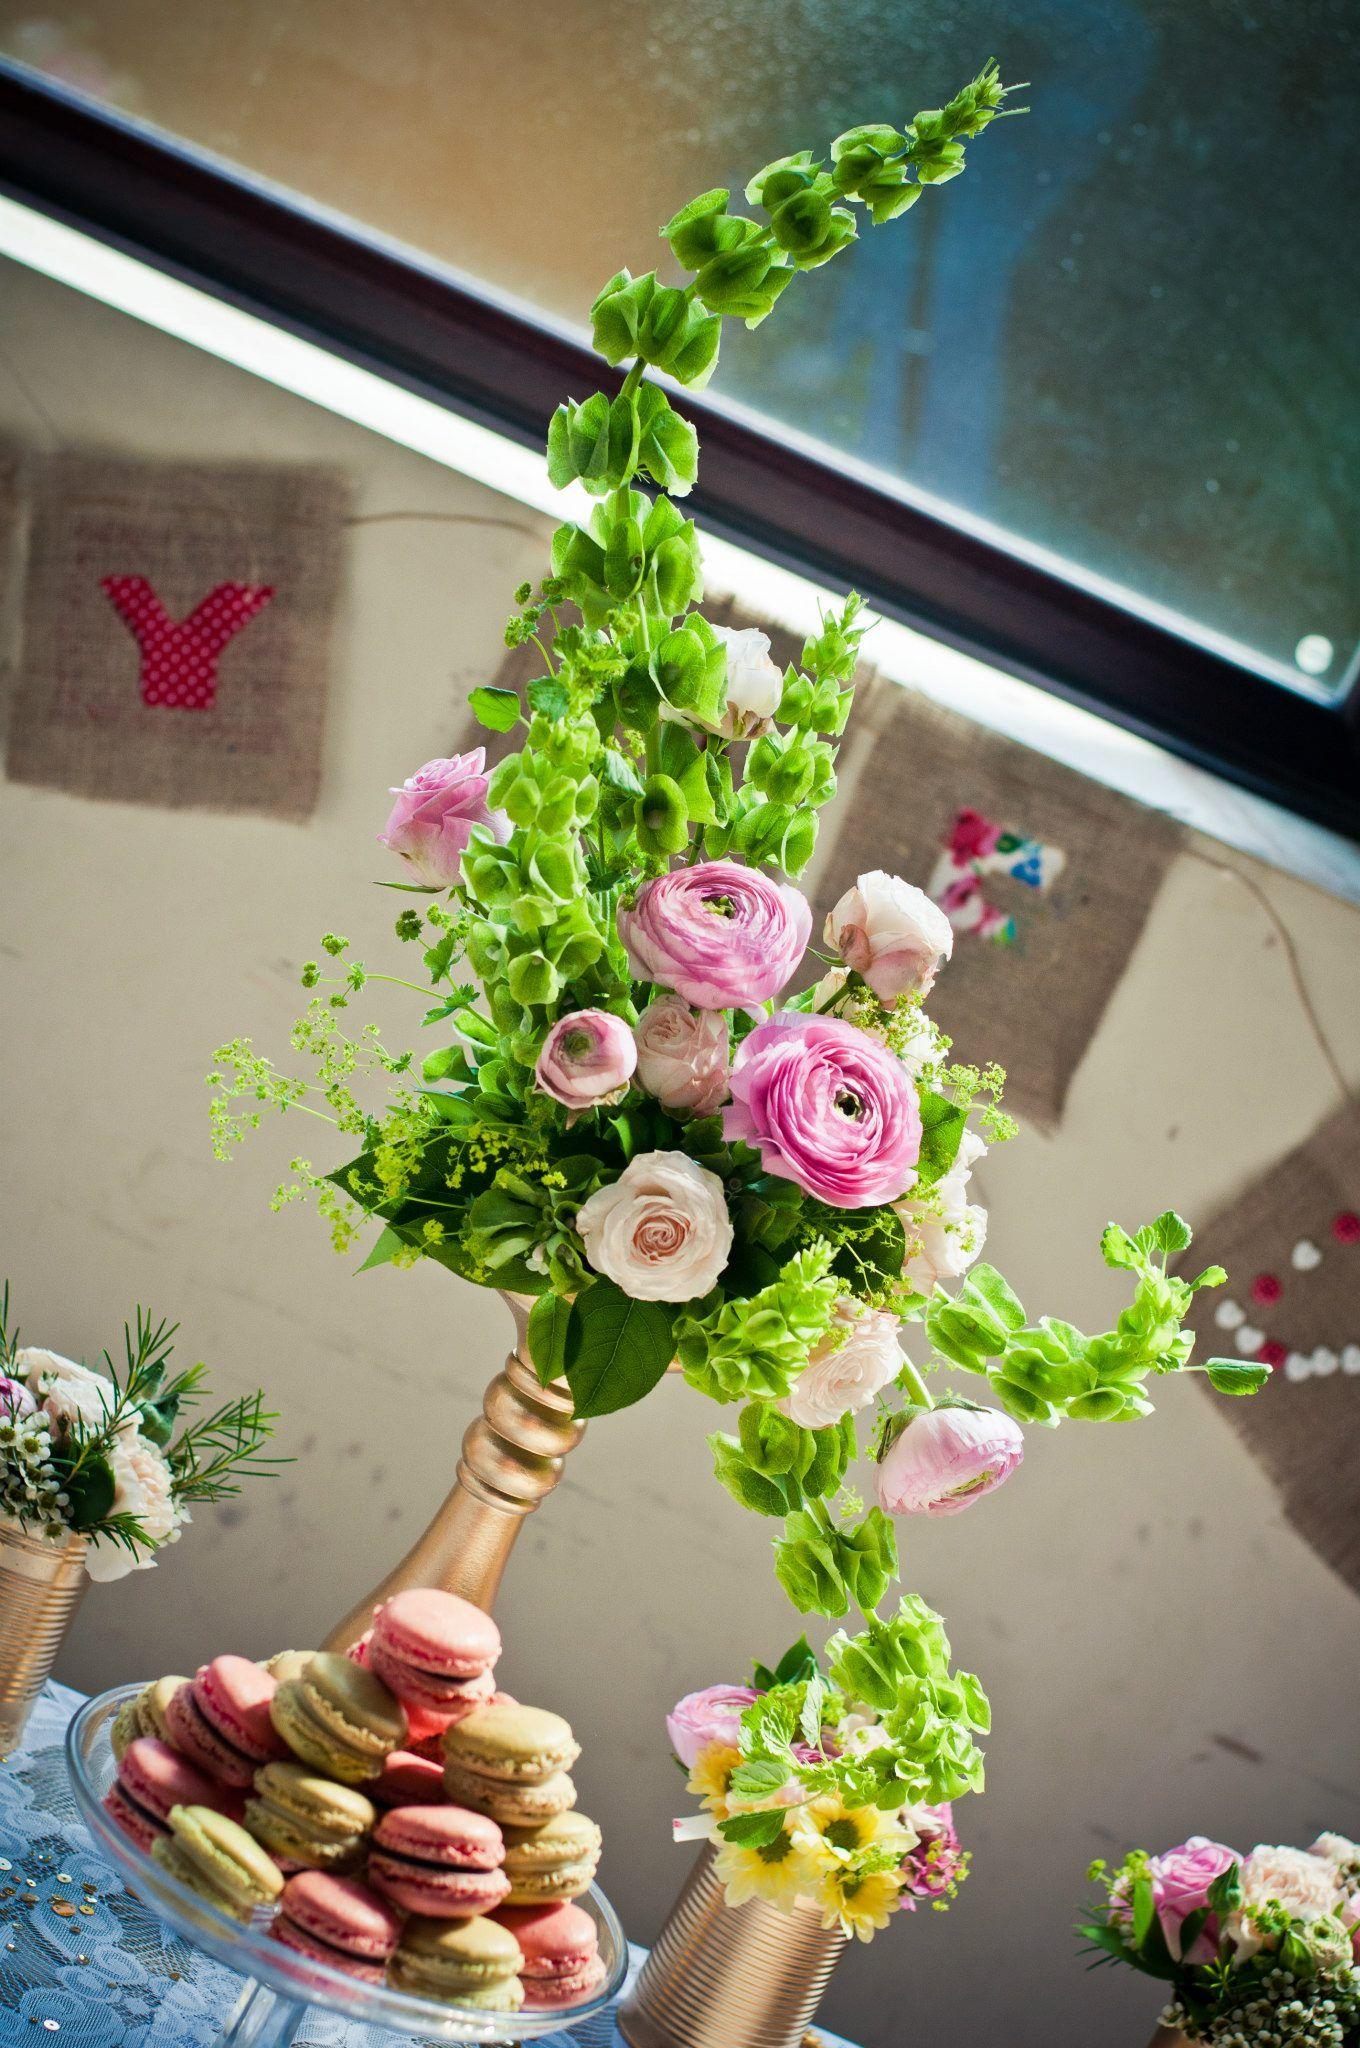 Hogarth Curve floral arrangement & Macarons | Macarons ...